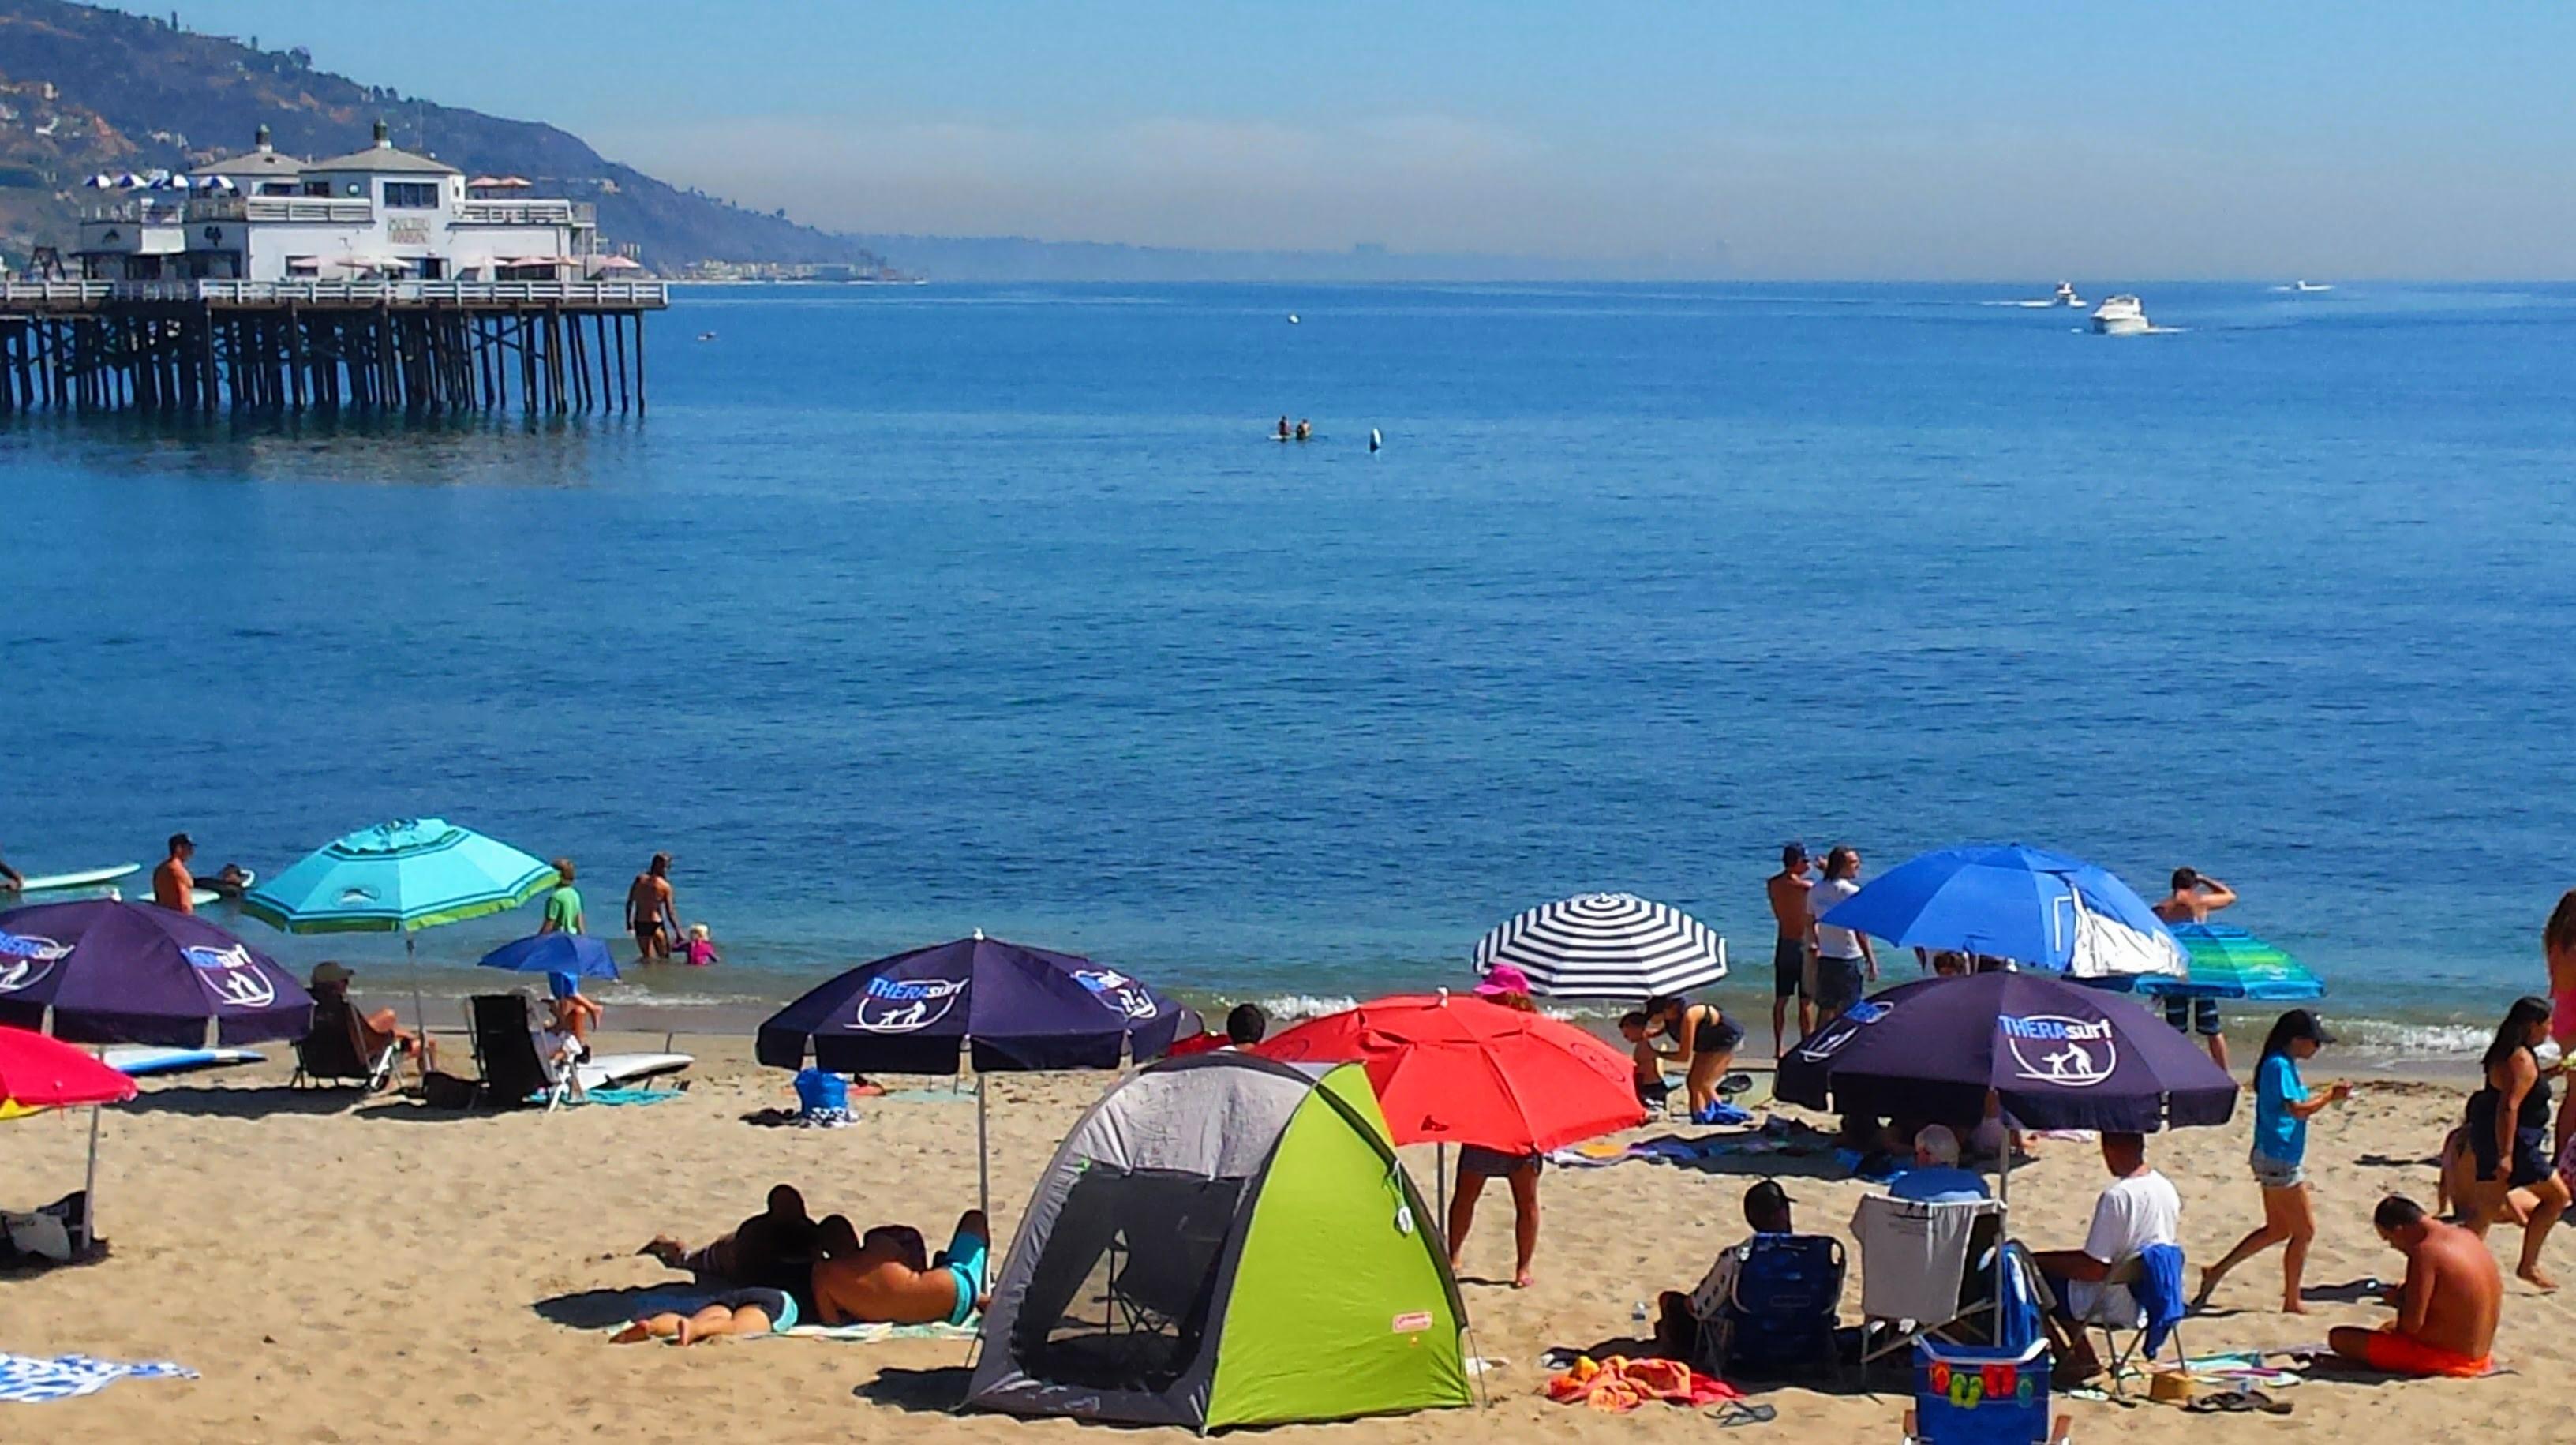 Malibu Beach and Pier on October Saturday